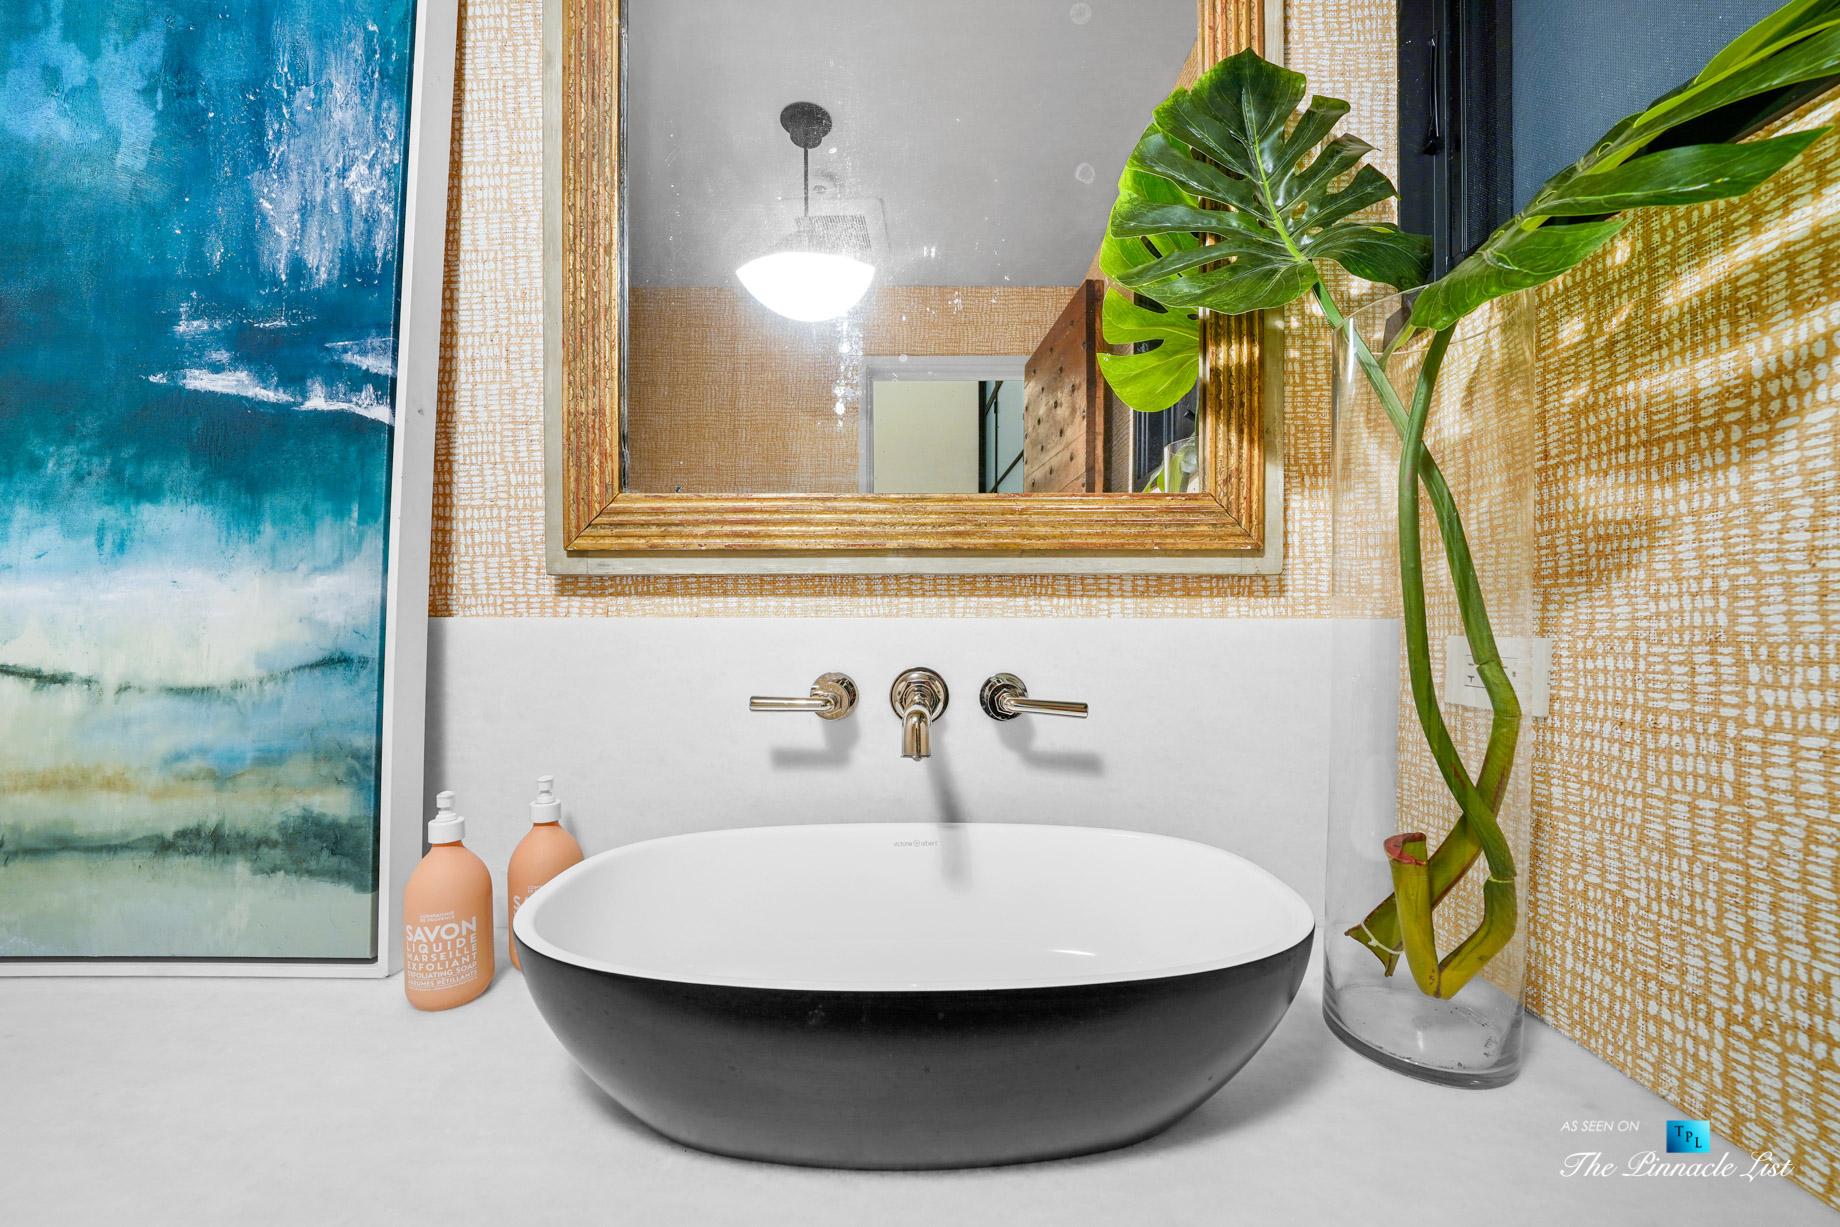 508 The Strand, Manhattan Beach, CA, USA - Luxurious Entry Washroom - Luxury Real Estate - Oceanfront Home